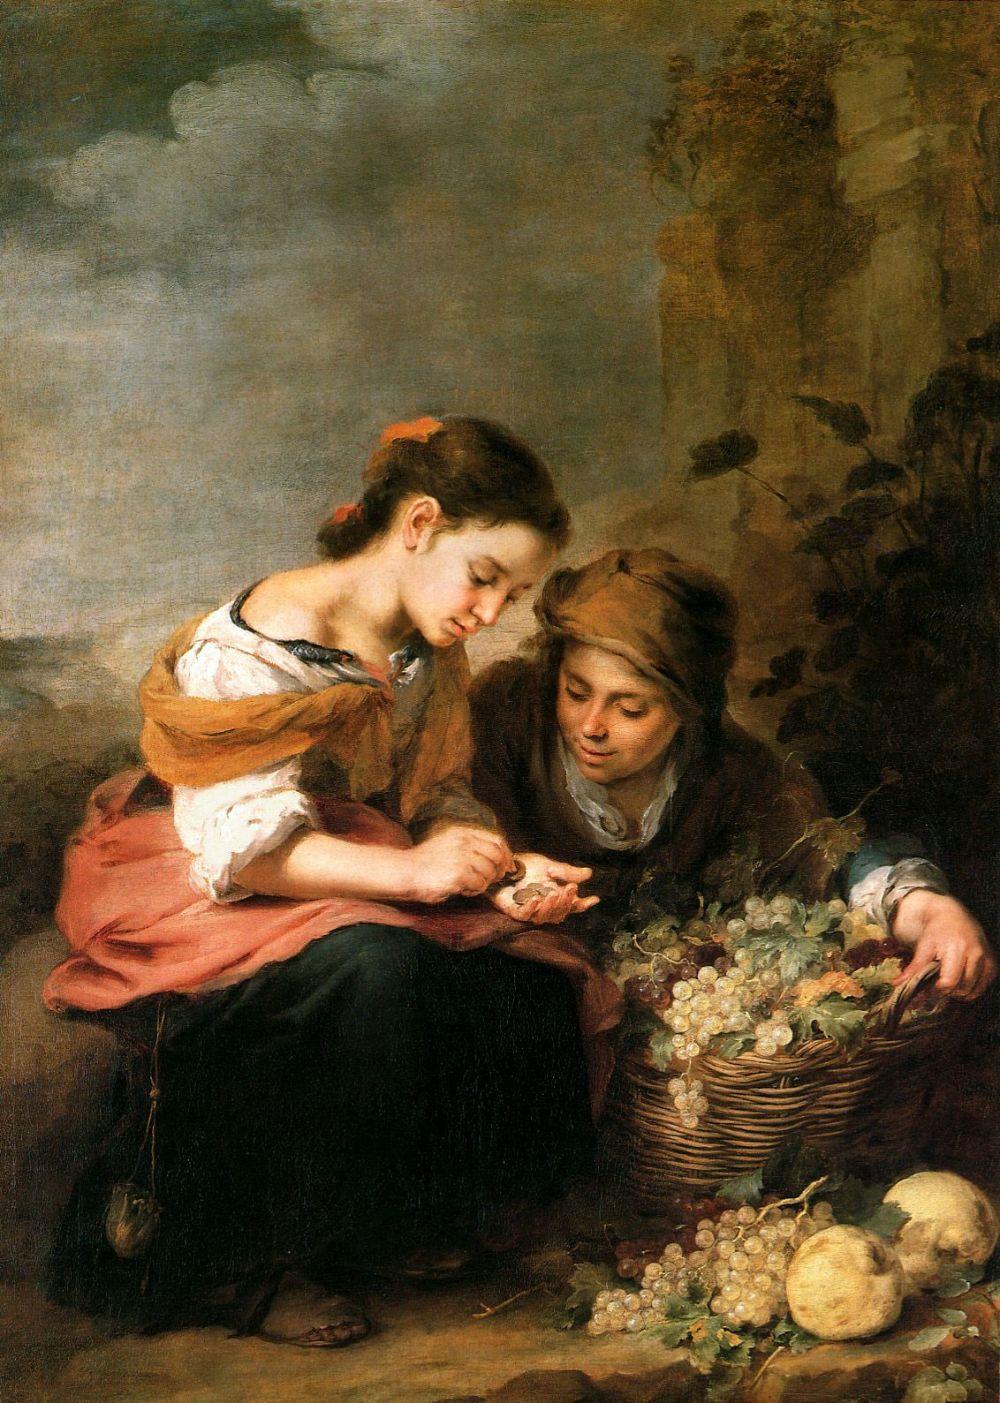 Bartolomé Esteban Murillo. La vendedora de fruta. Hacia 1670-1675. Alte Pinakothek. Munich.